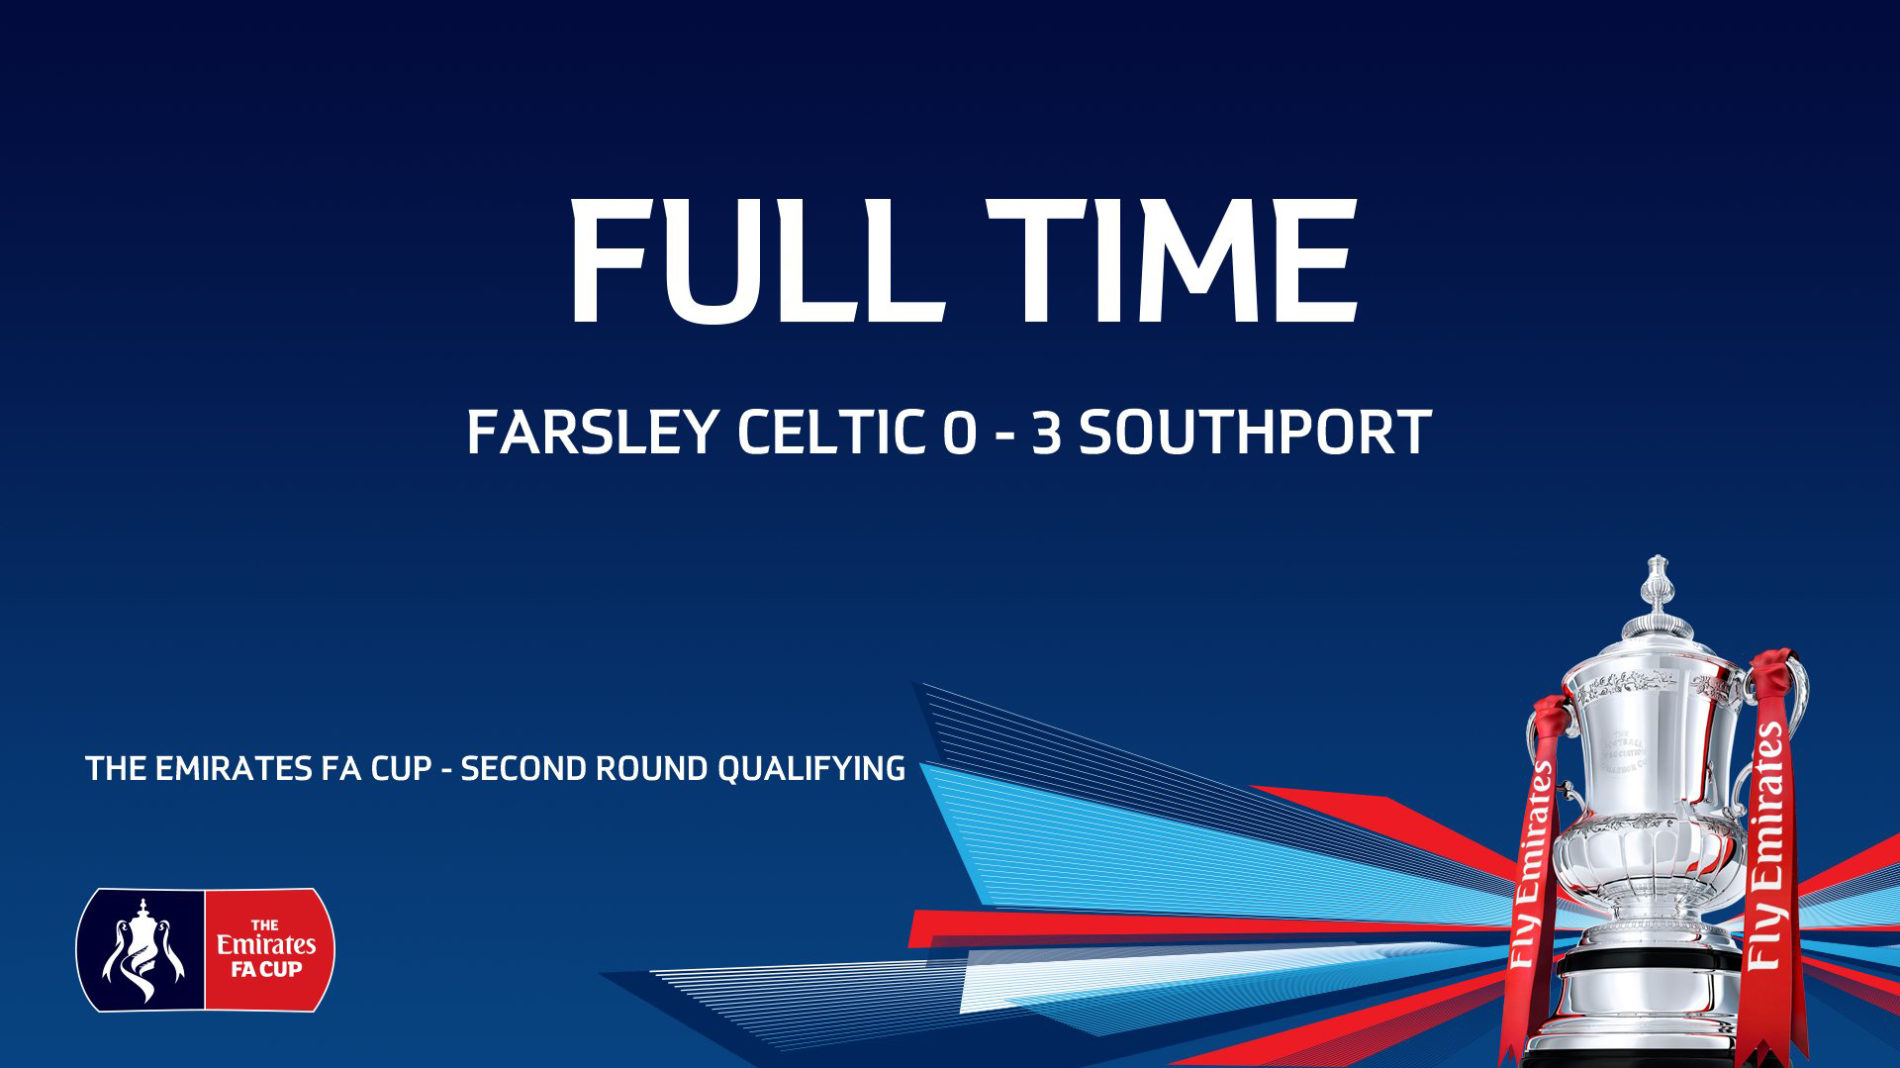 MATCH REPORT | Farsley Celtic 0-3 Southport – FA Cup